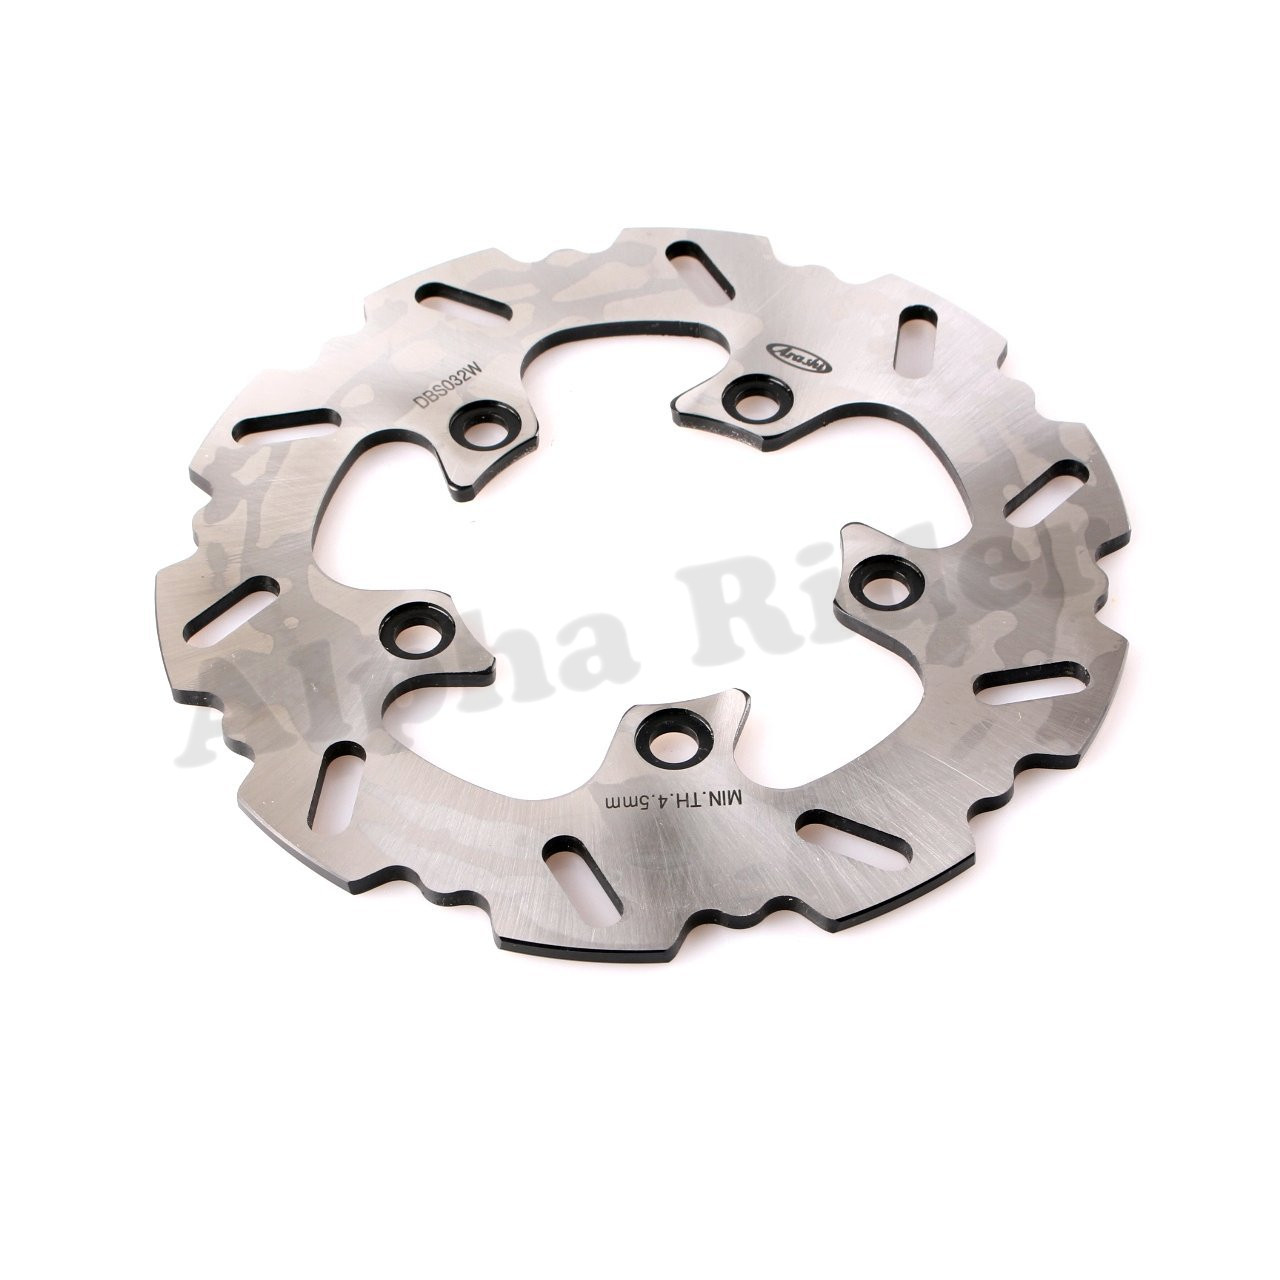 ФОТО 1 Pcs Steel Rear Brake Rotors Disc Braking Disk for Suzuki GSXR600 1997-2012 GSXR750 1996-2012 GSXR1000 2001-2011 GSXR1100 87-88